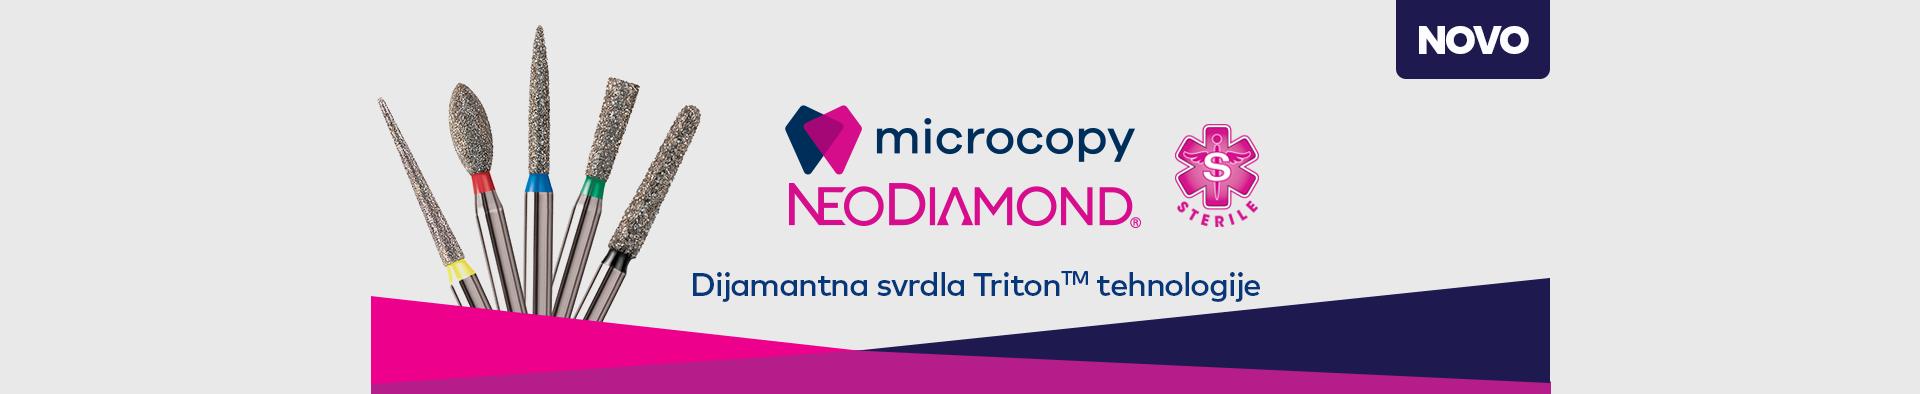 microcopy-09-2020_slider